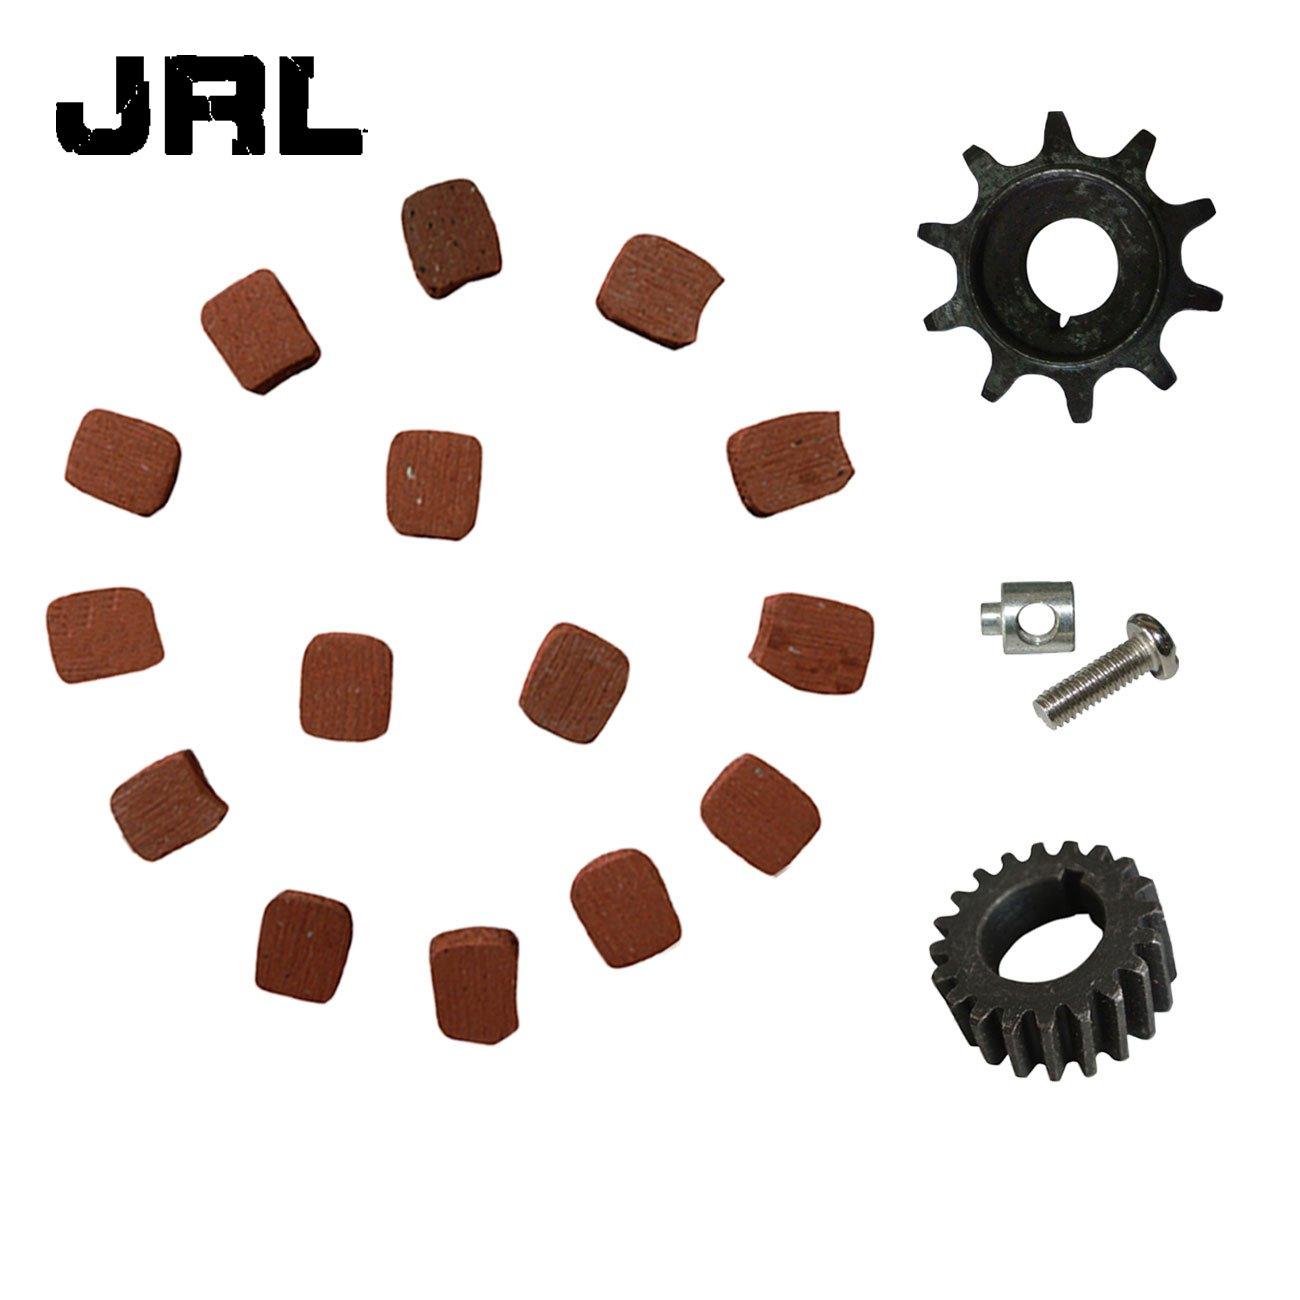 "9.525mm Loose G16 Hardened Carbon Steel Bearing Balls 3//8/"" inch 50 PCS"